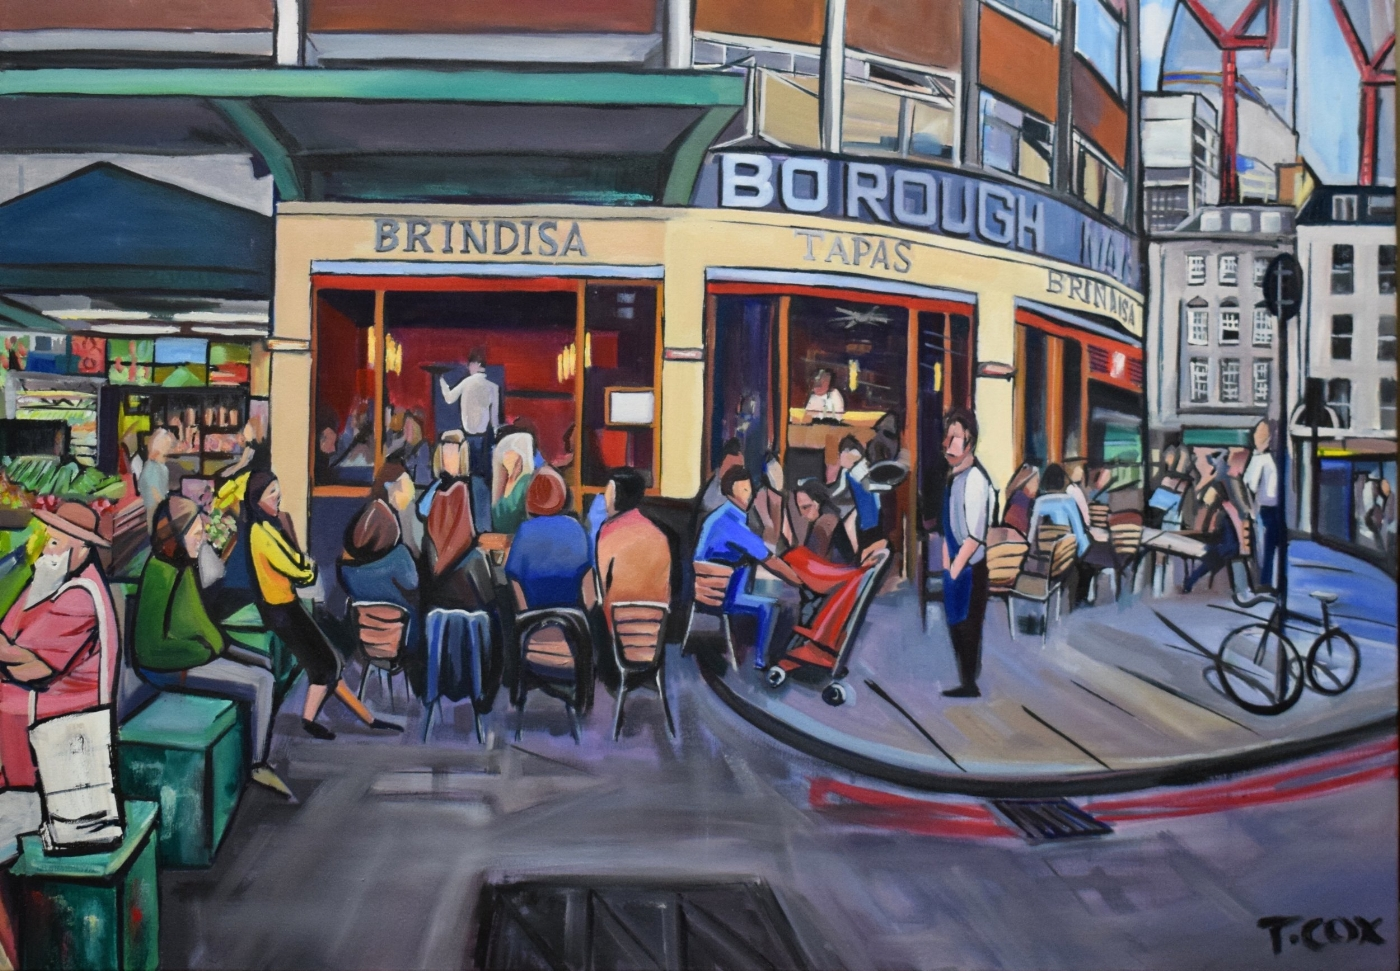 Brindisa, 2018 | Ink & oil on canvas | 100 x 70 cm | £2,000